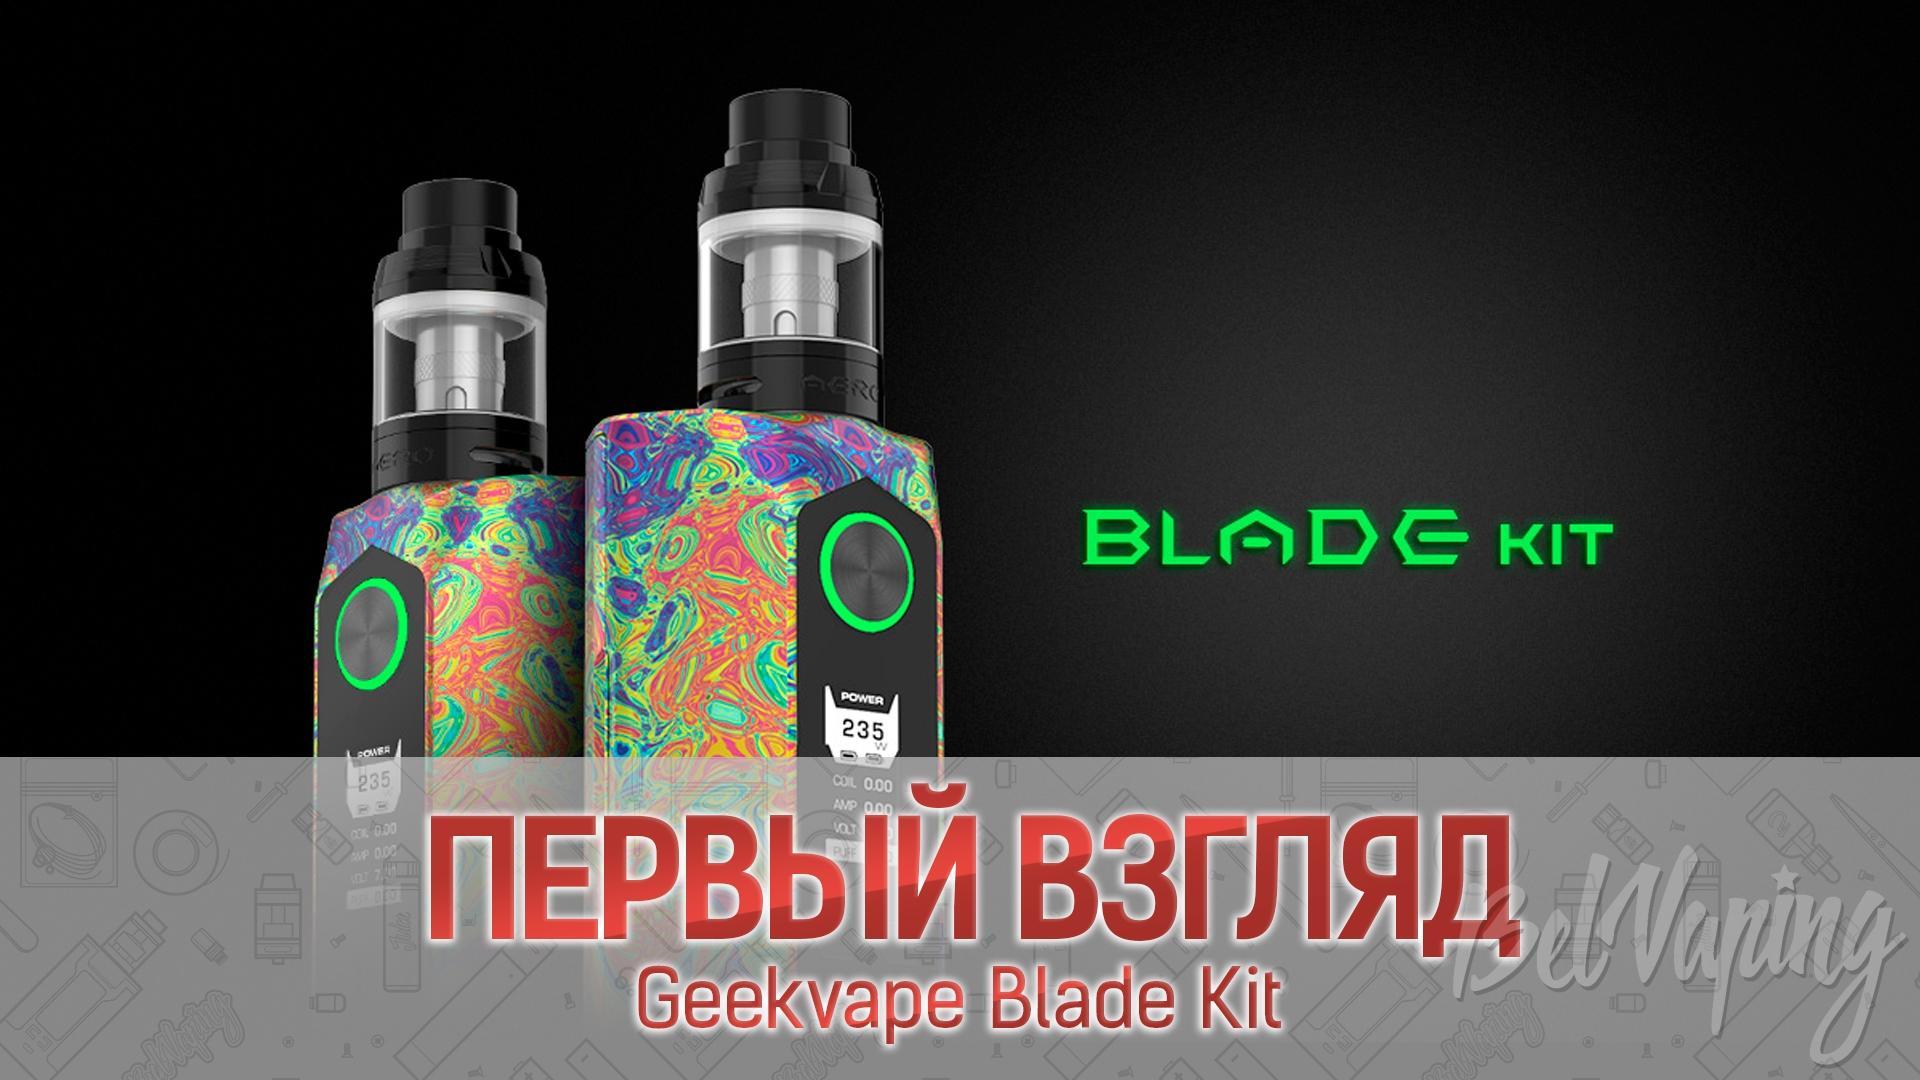 Geekvape Blade Kit. Первый взгляд